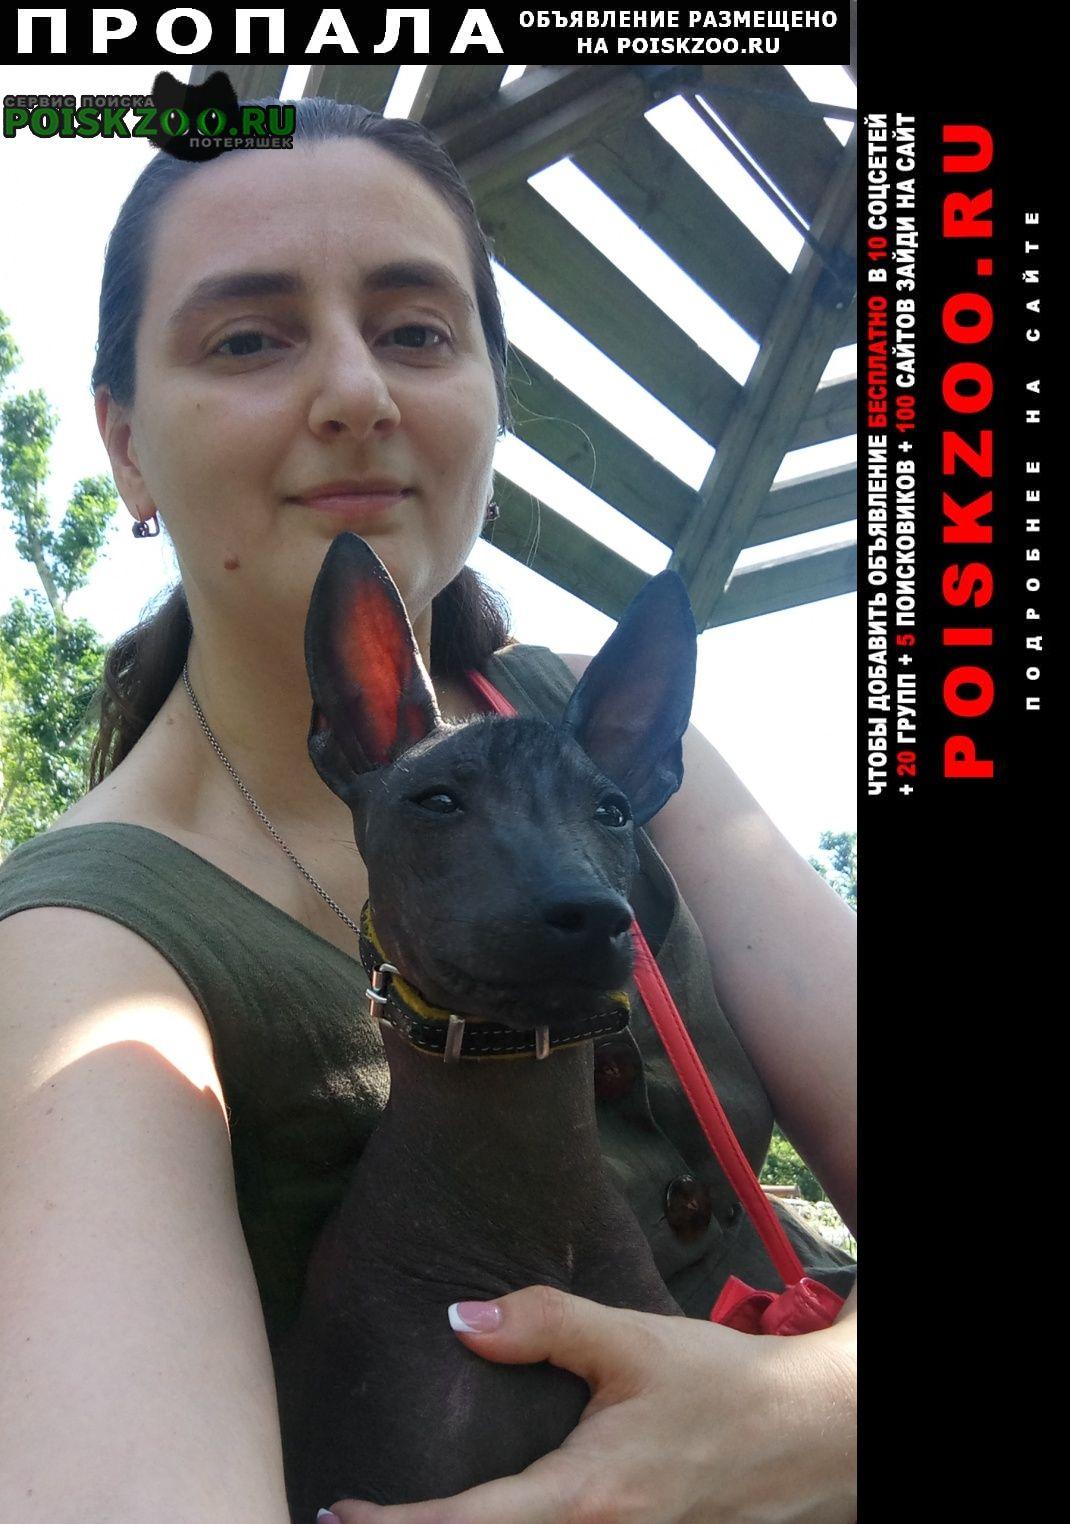 Пропала собака кобель мартин Москва